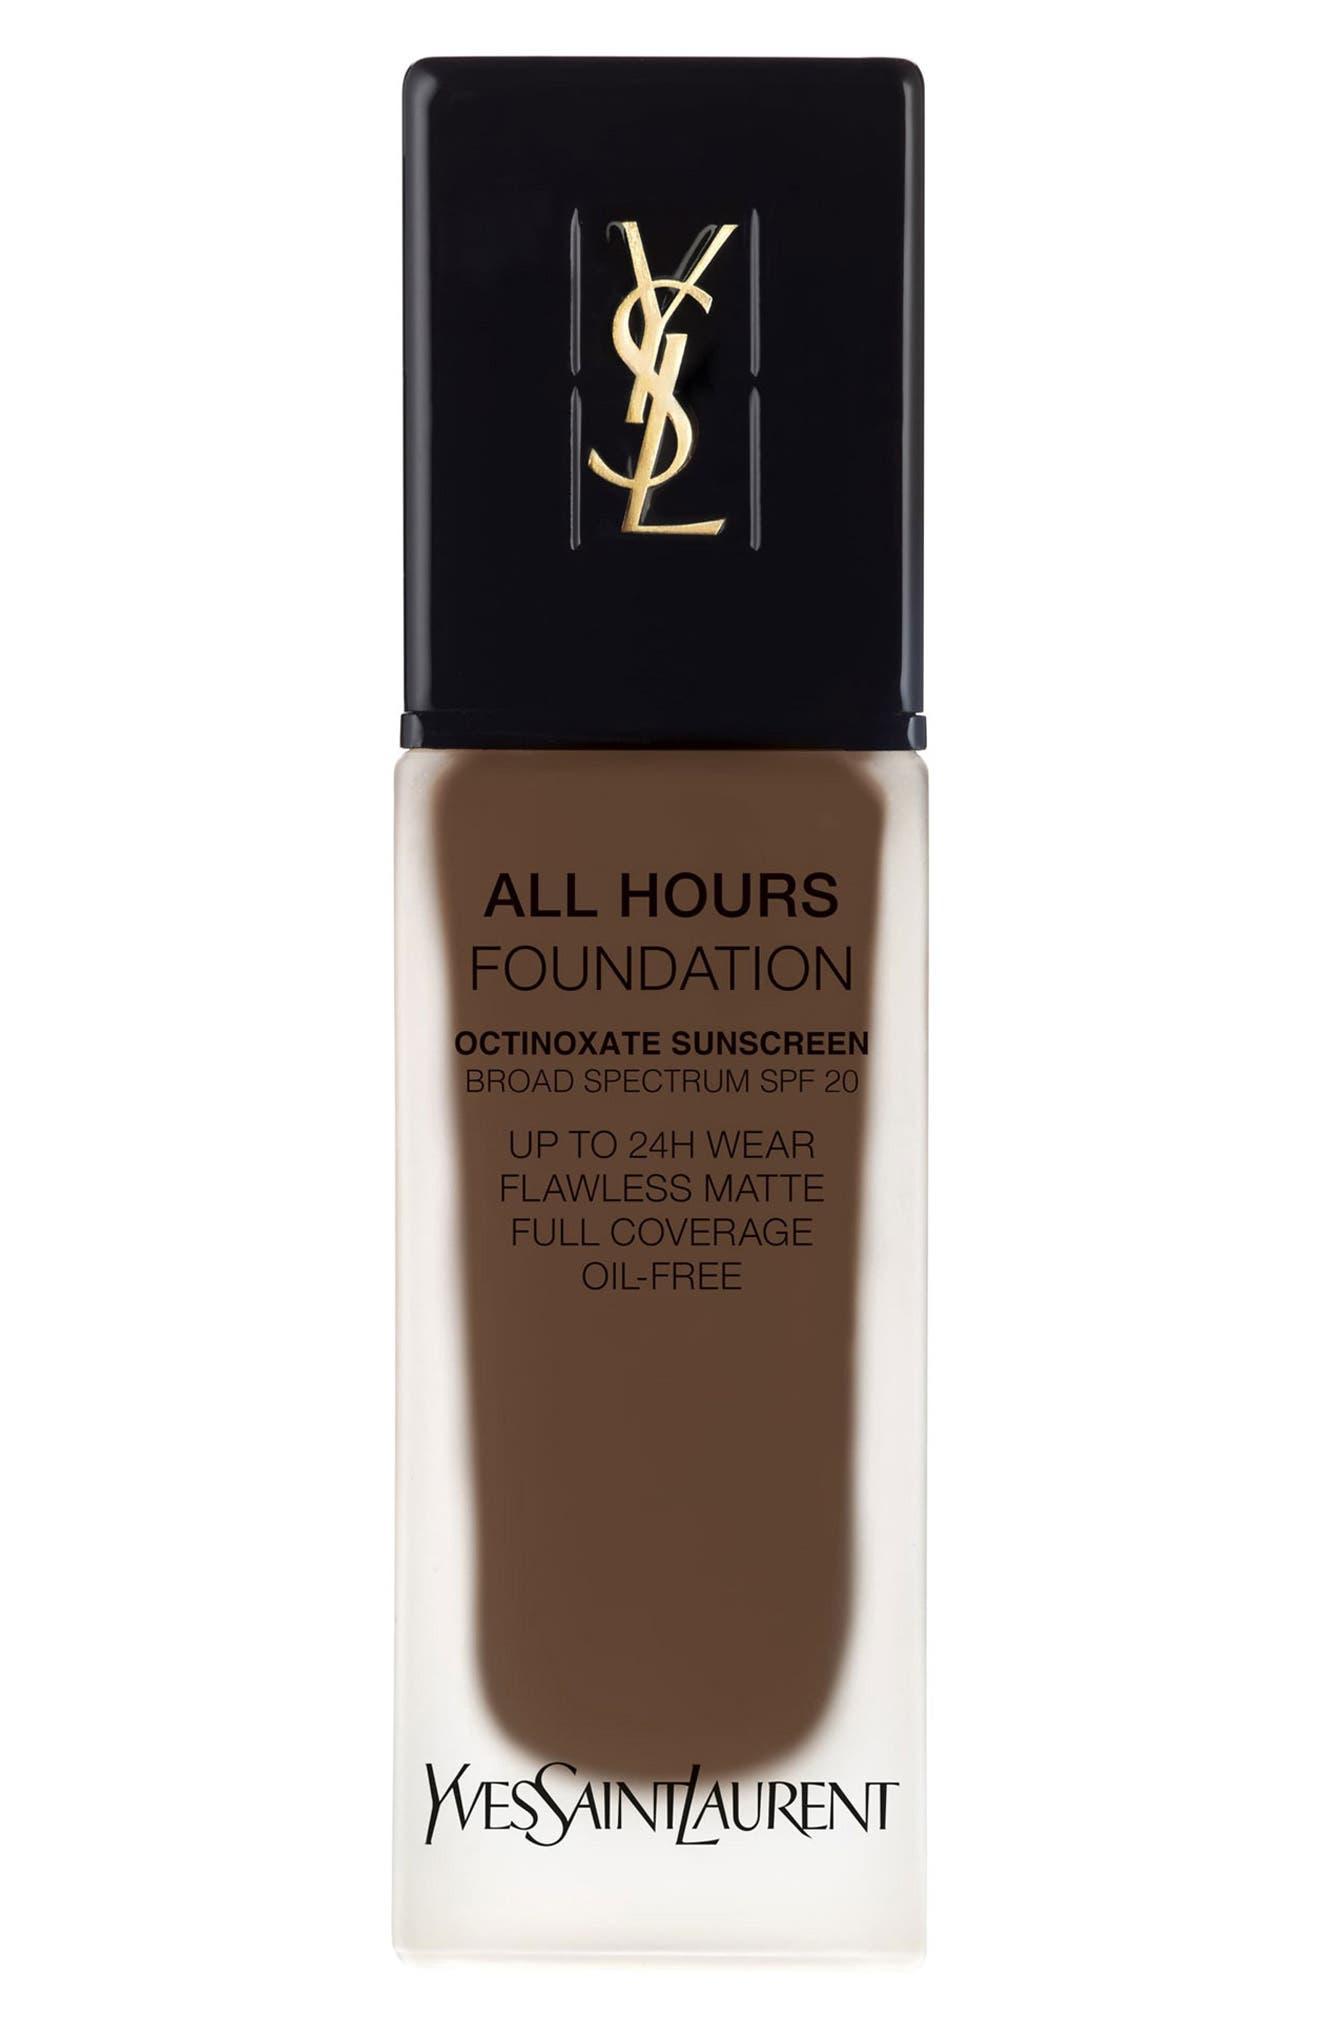 Yves Saint Laurent All Hours Full Coverage Matte Foundation Spf 20 - B95 Espresso